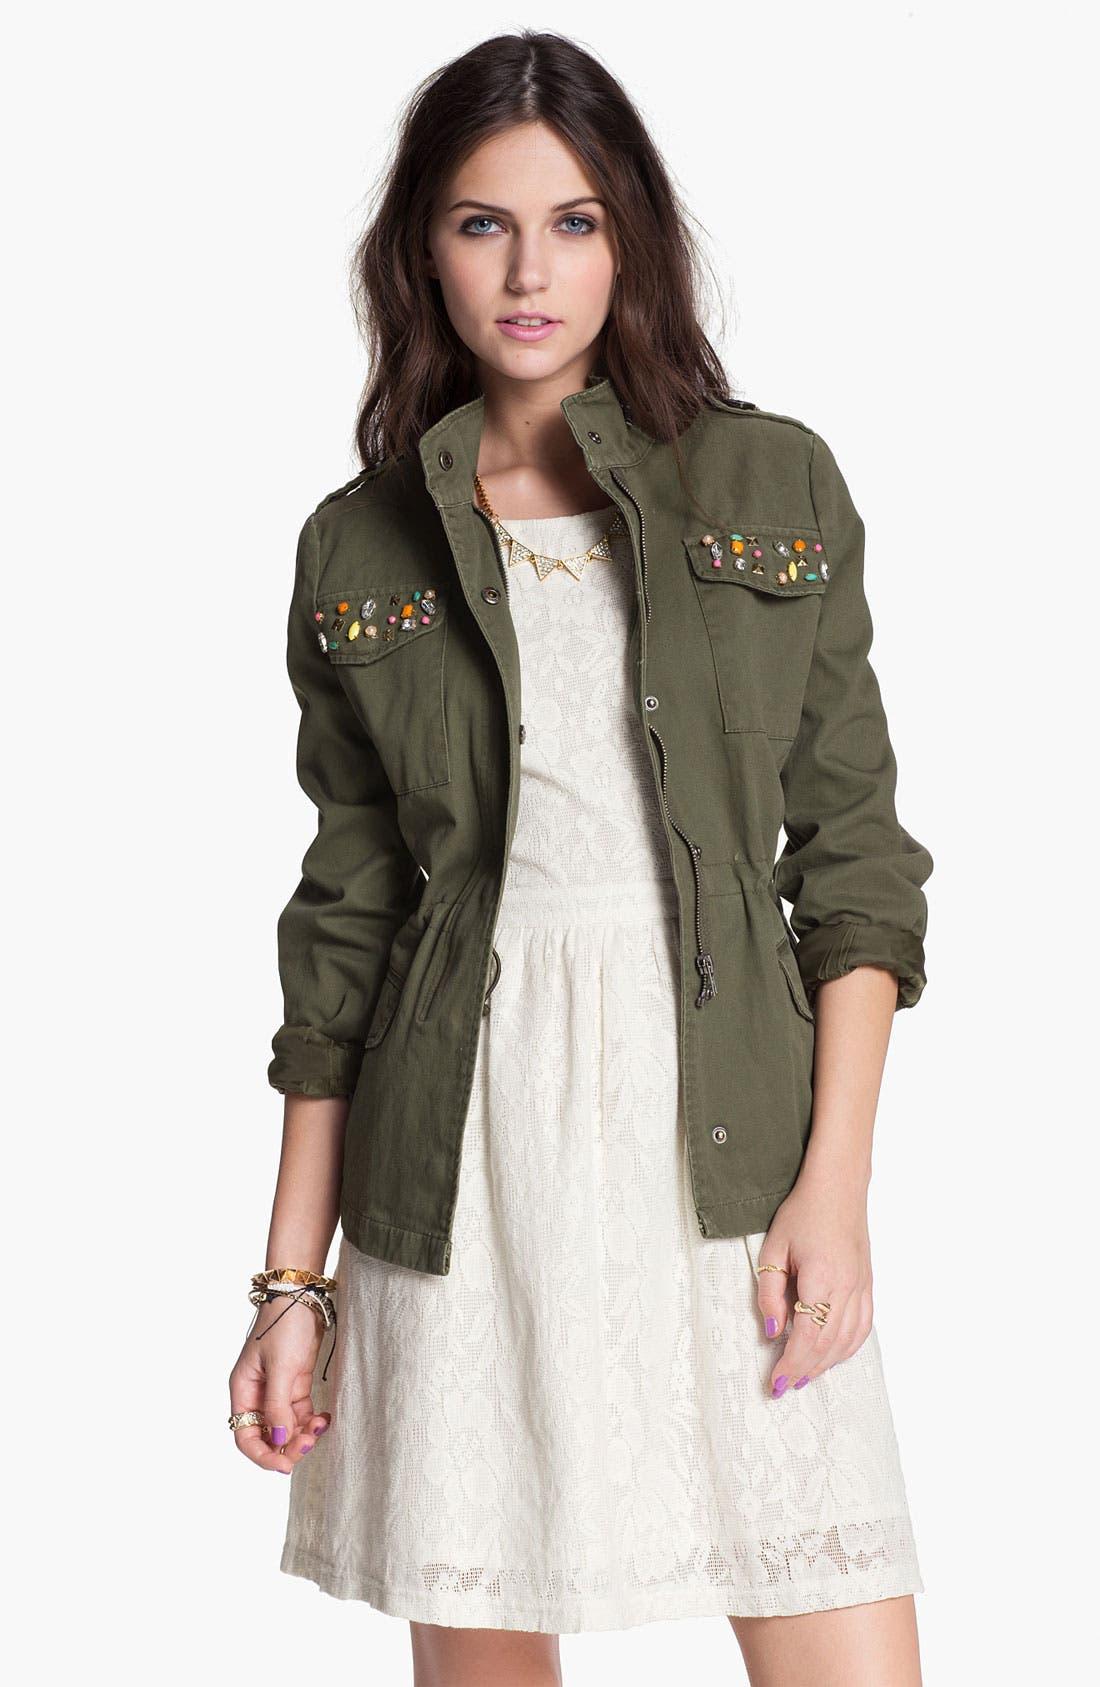 Alternate Image 1 Selected - Jolt Embellished Utility Jacket (Juniors)